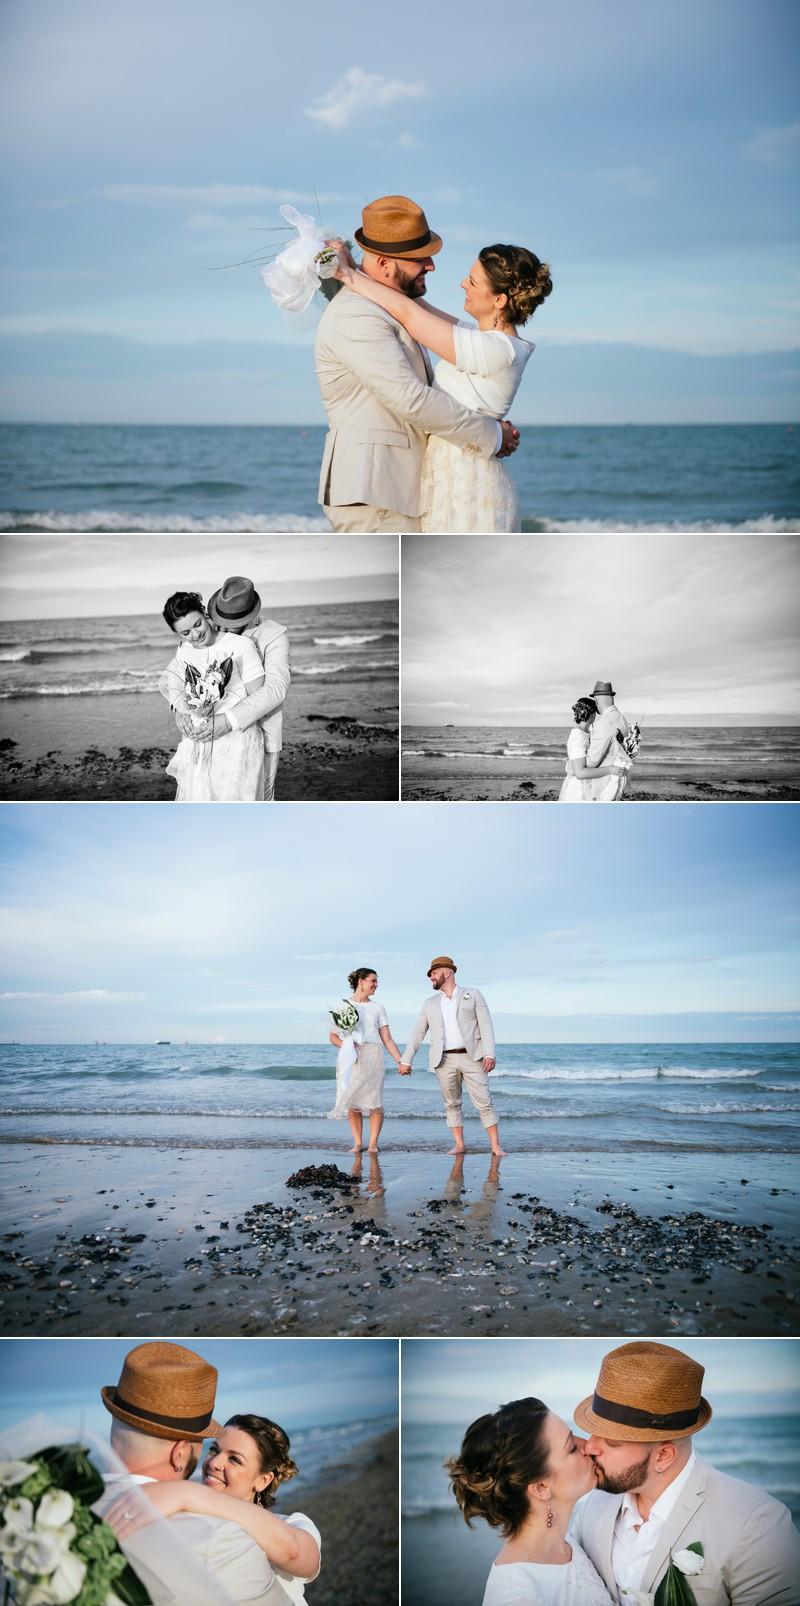 Fotografo matrimonio spiaggia singita marina di ravenna 6